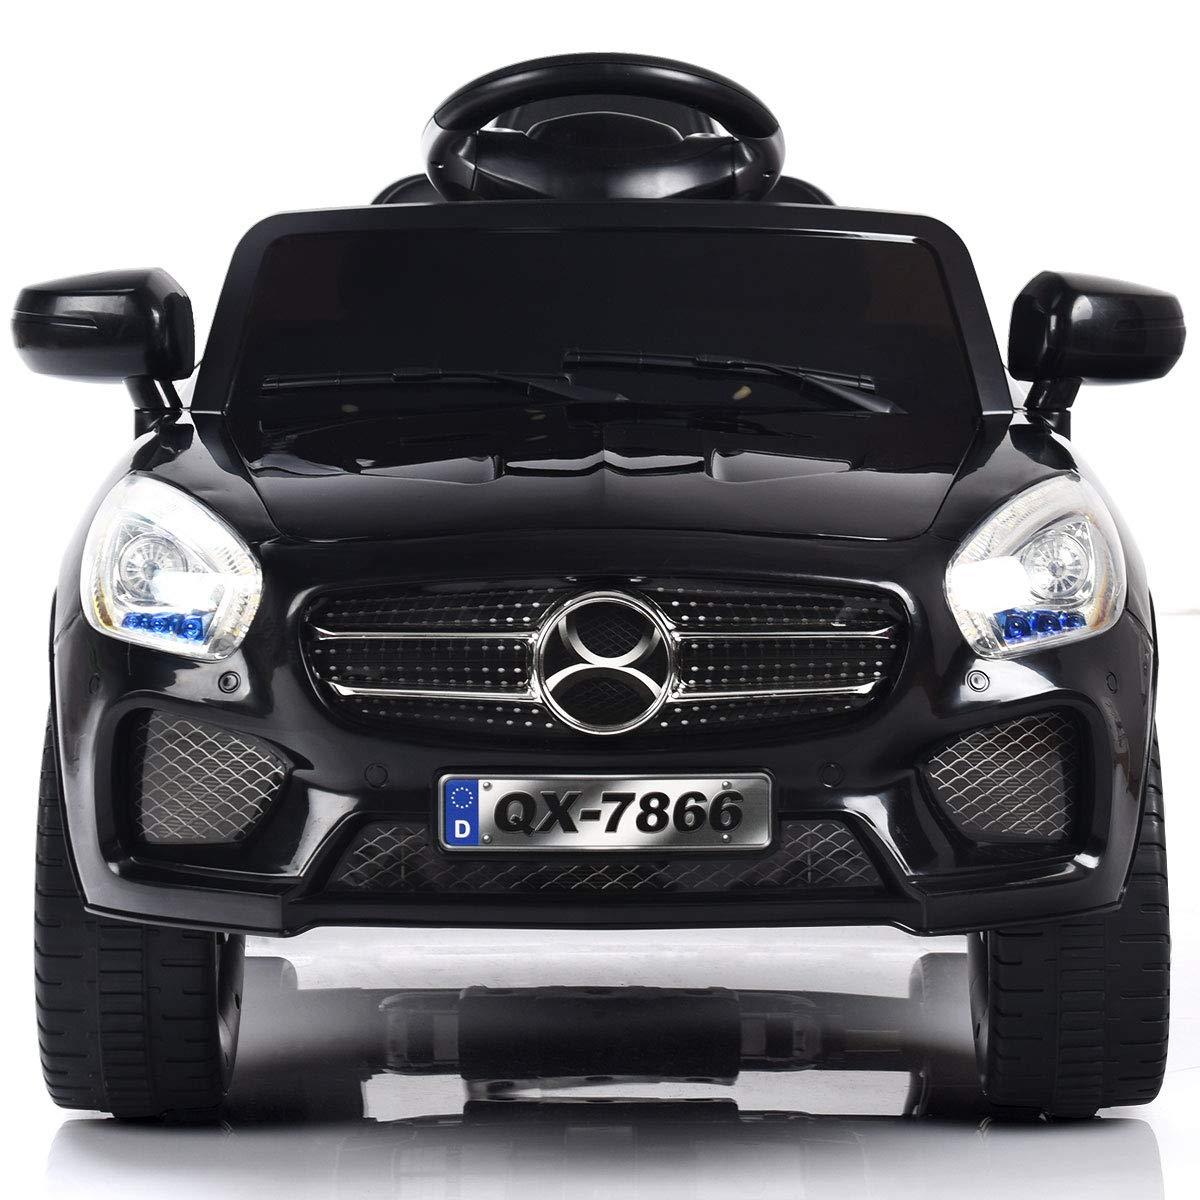 RC Parental /& Manual Modes Children Electric Vehicle w//Lights MP3 / Costzon Kids Ride On Car Black